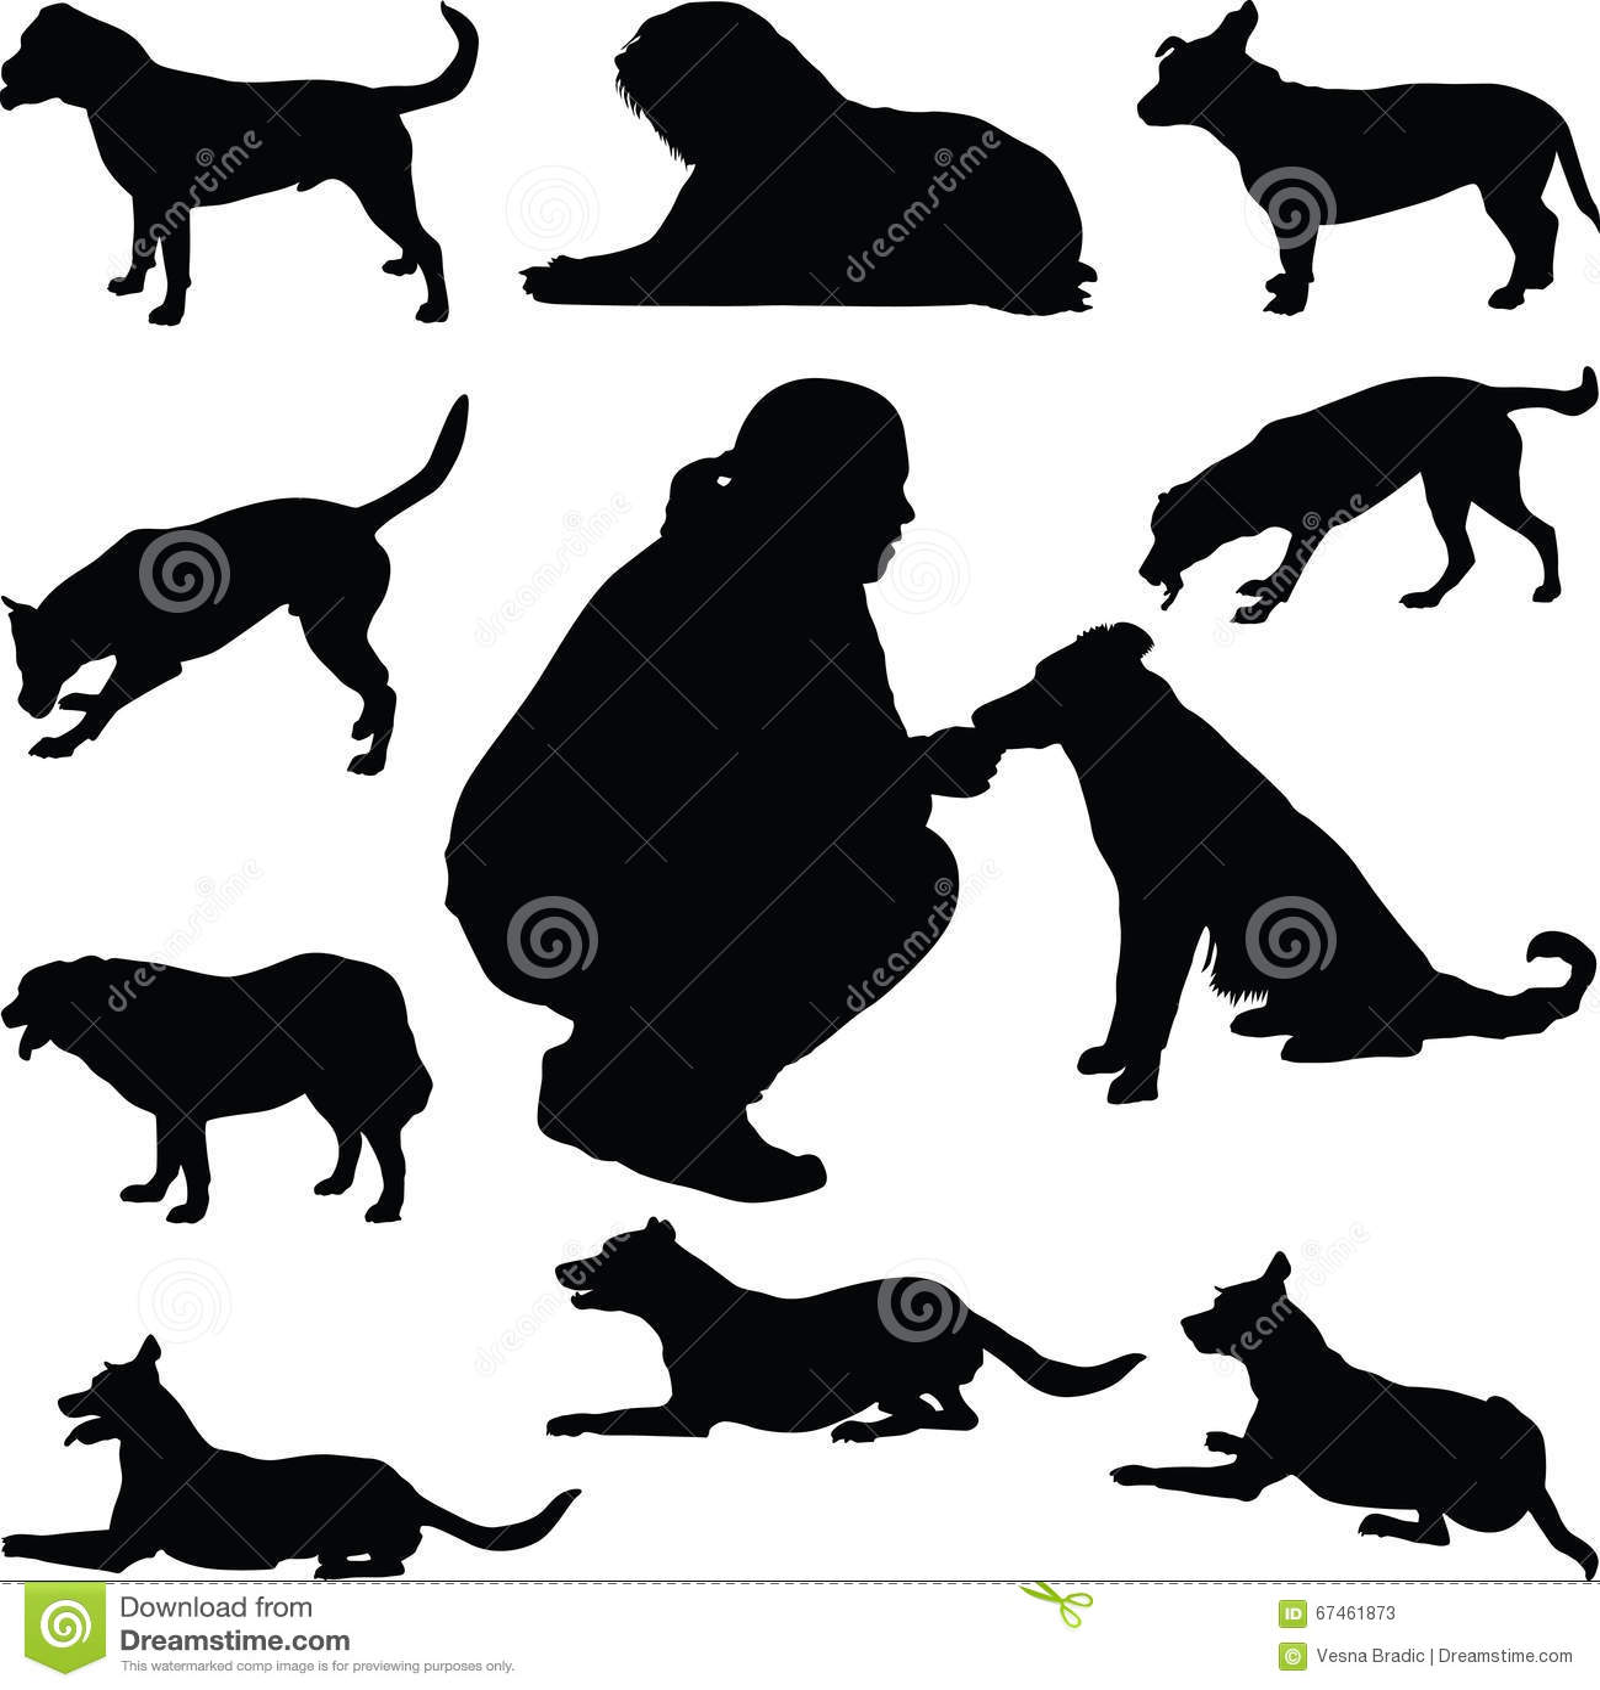 Staffordshire Bull Terrier Dog Silhouette Cartoon Vector